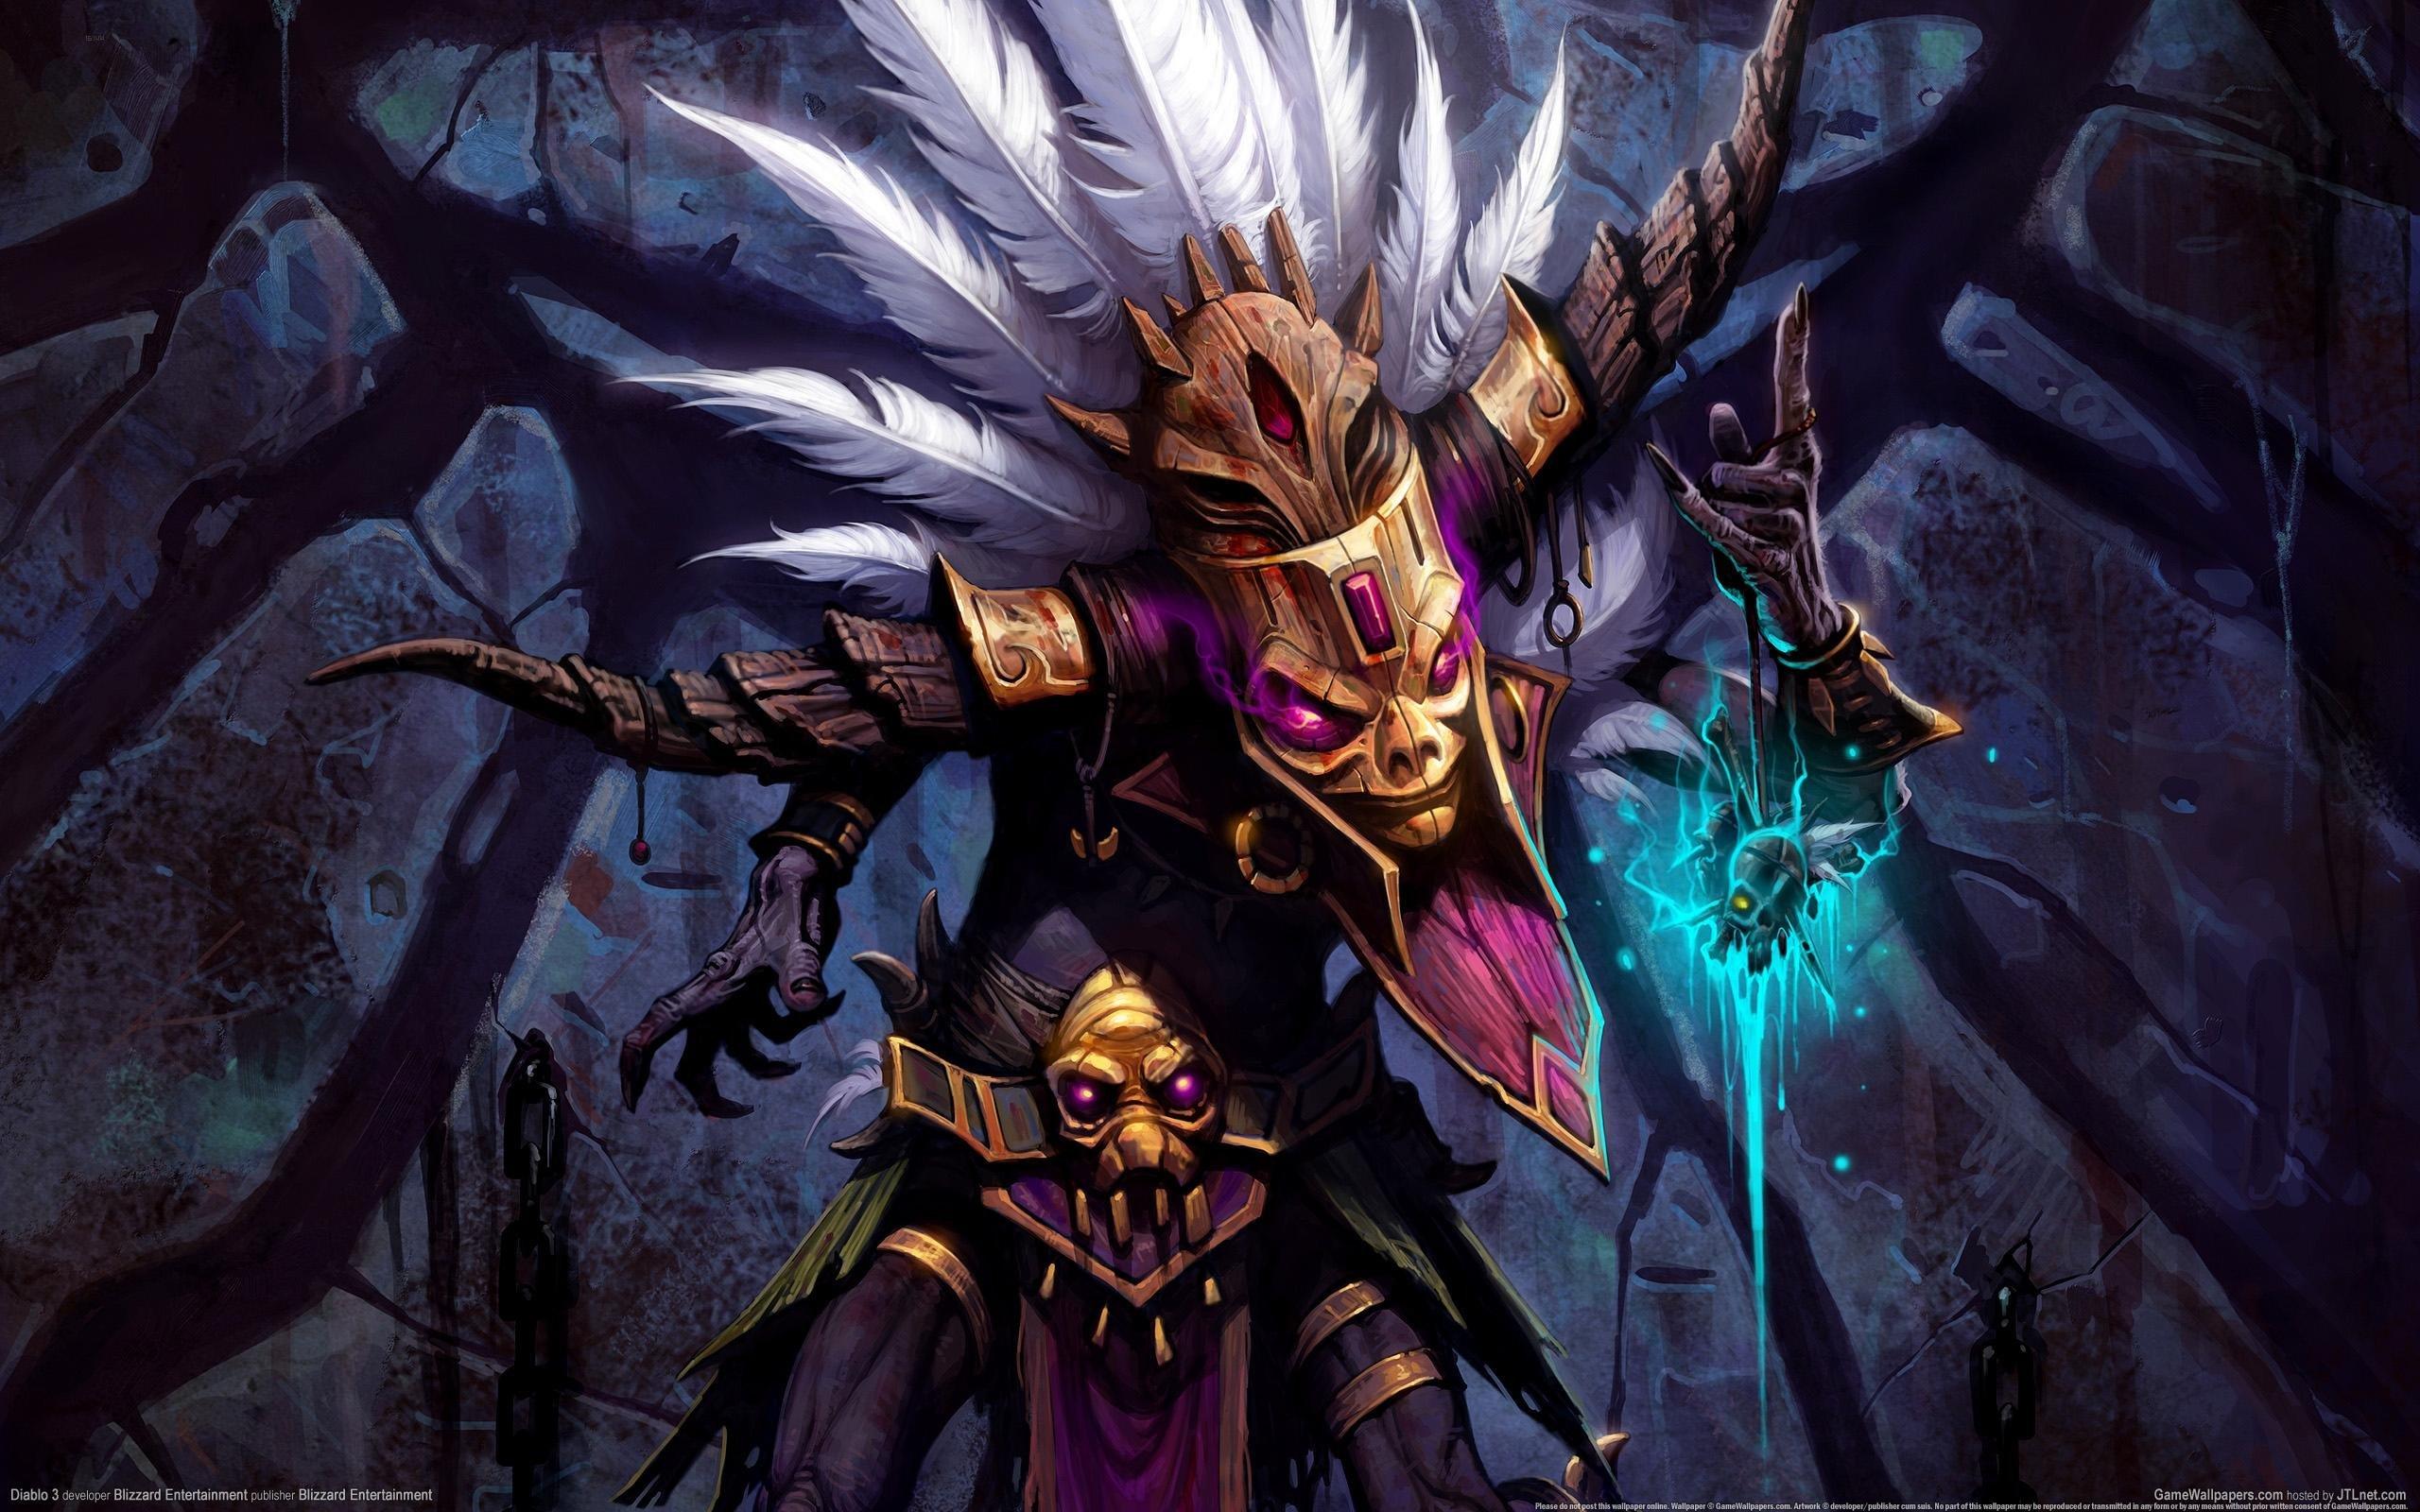 Download Hd 2560x1600 Diablo 3 Pc Wallpaper Id30889 For Free